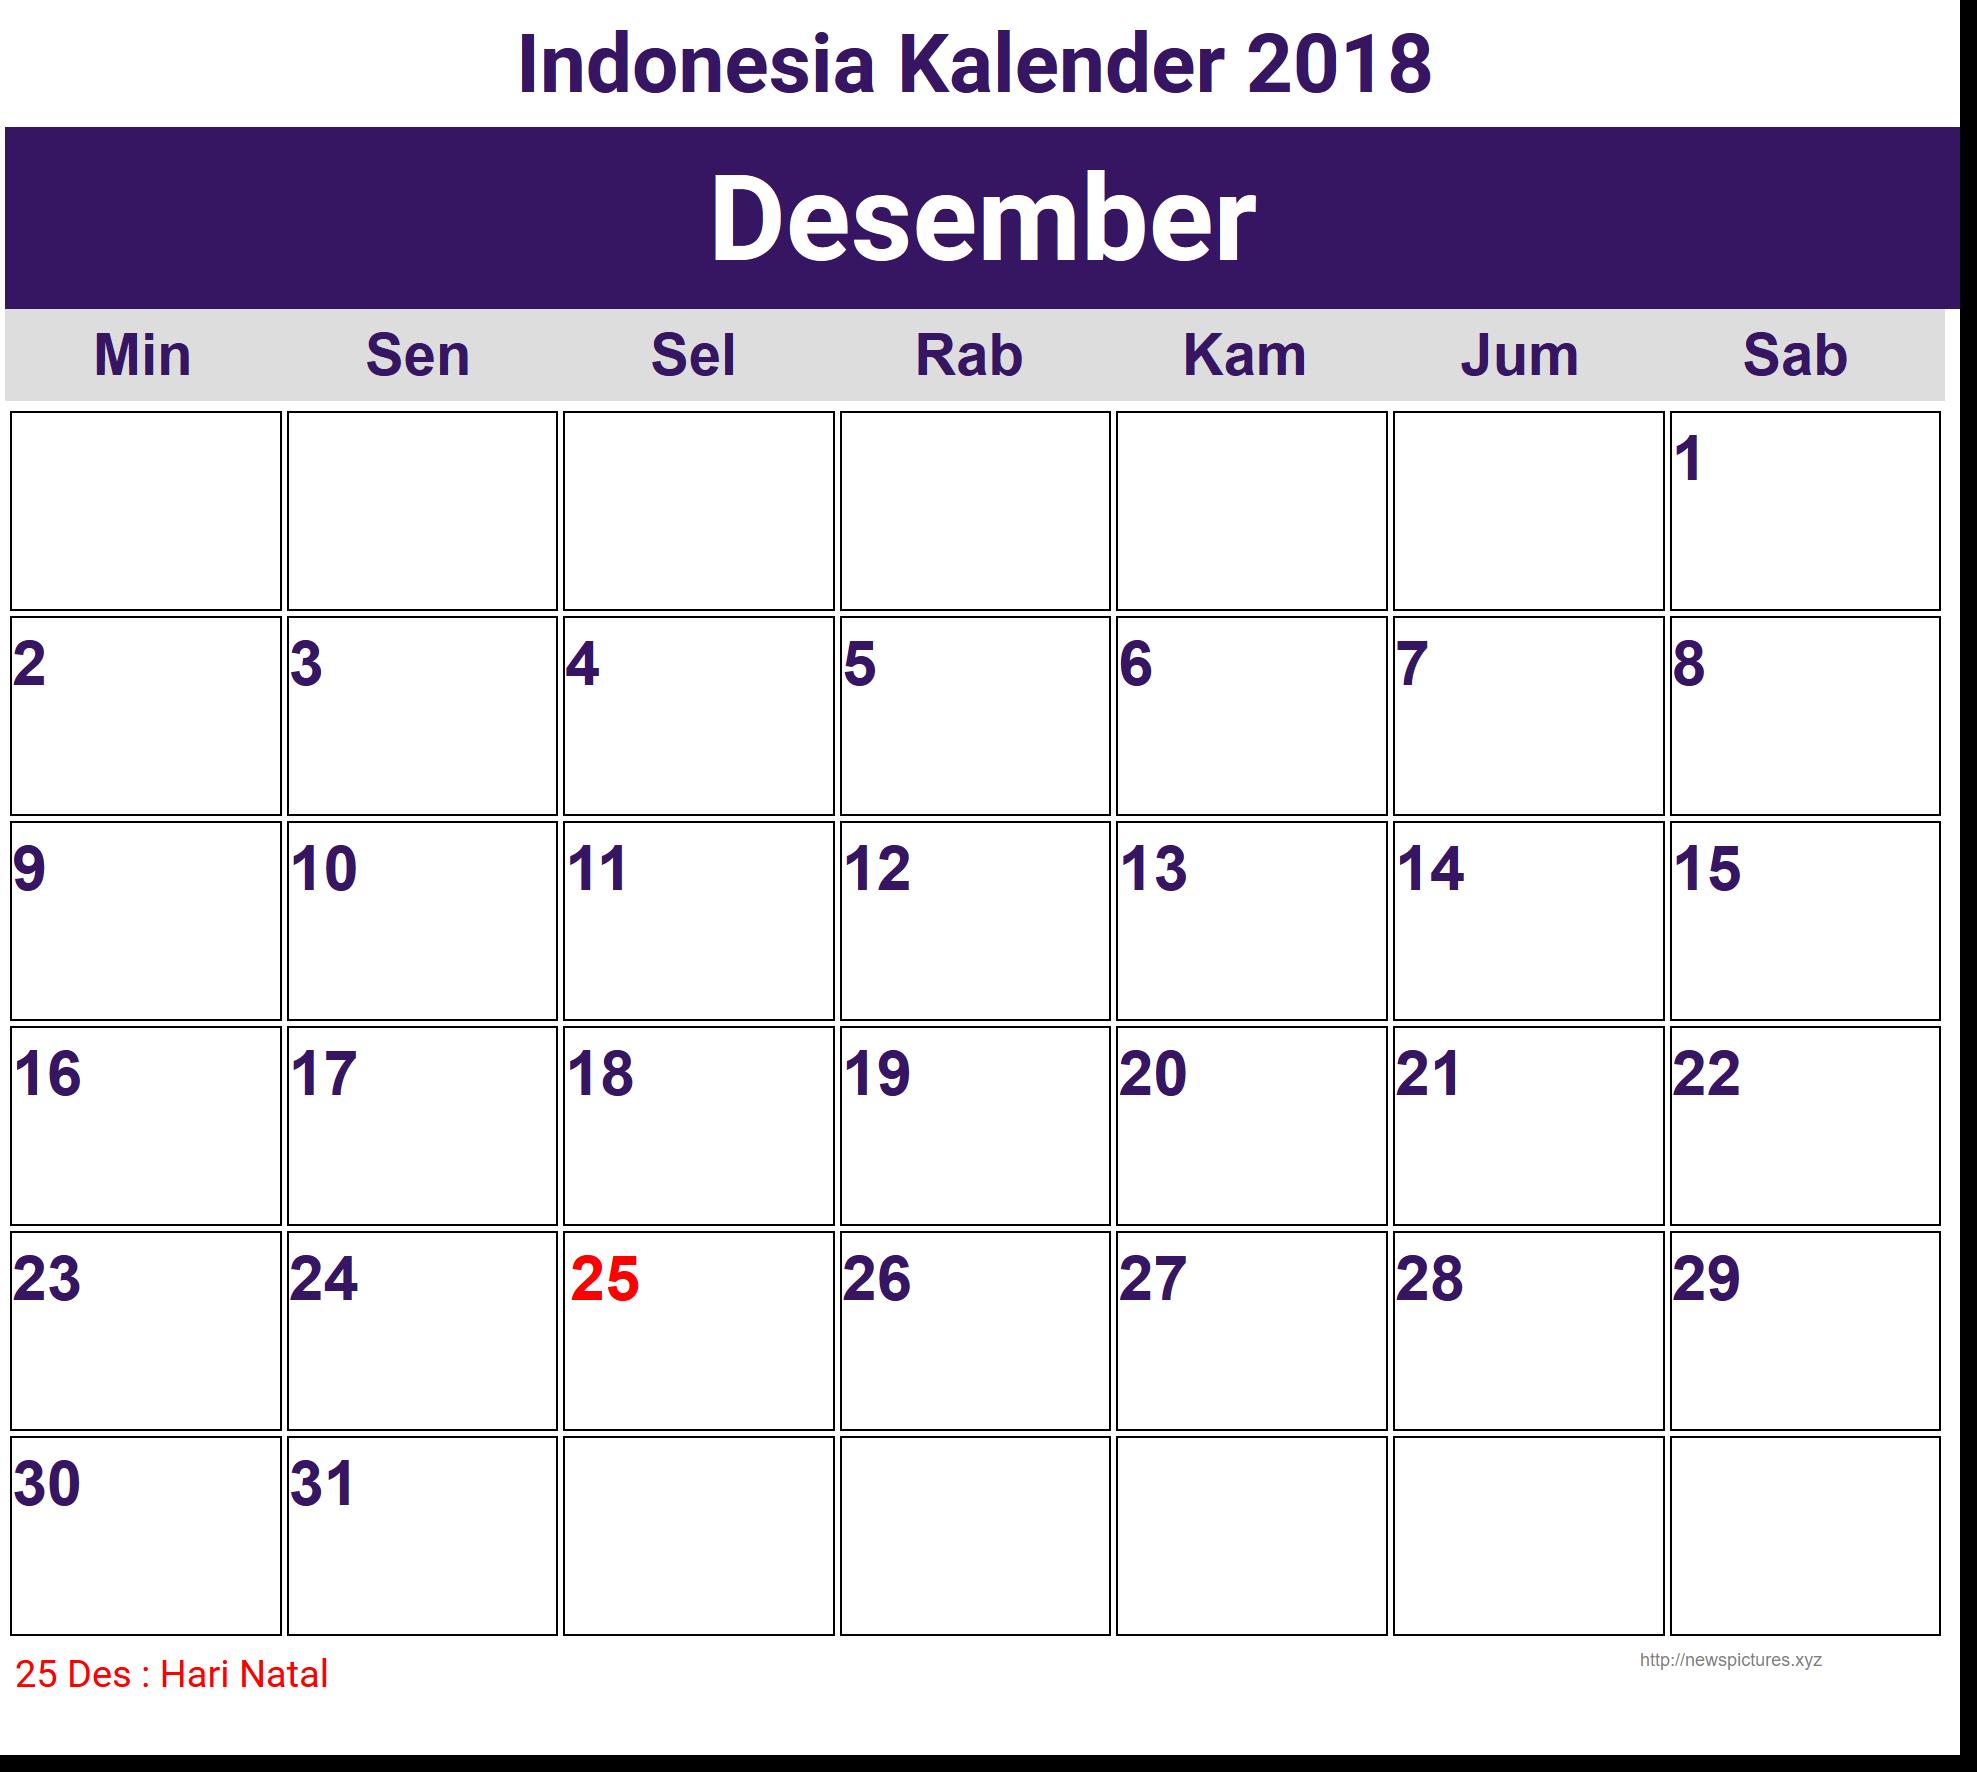 Image For Desember Indonesia Kalender 2018 Calendar 2018 Calendar Constitution Day